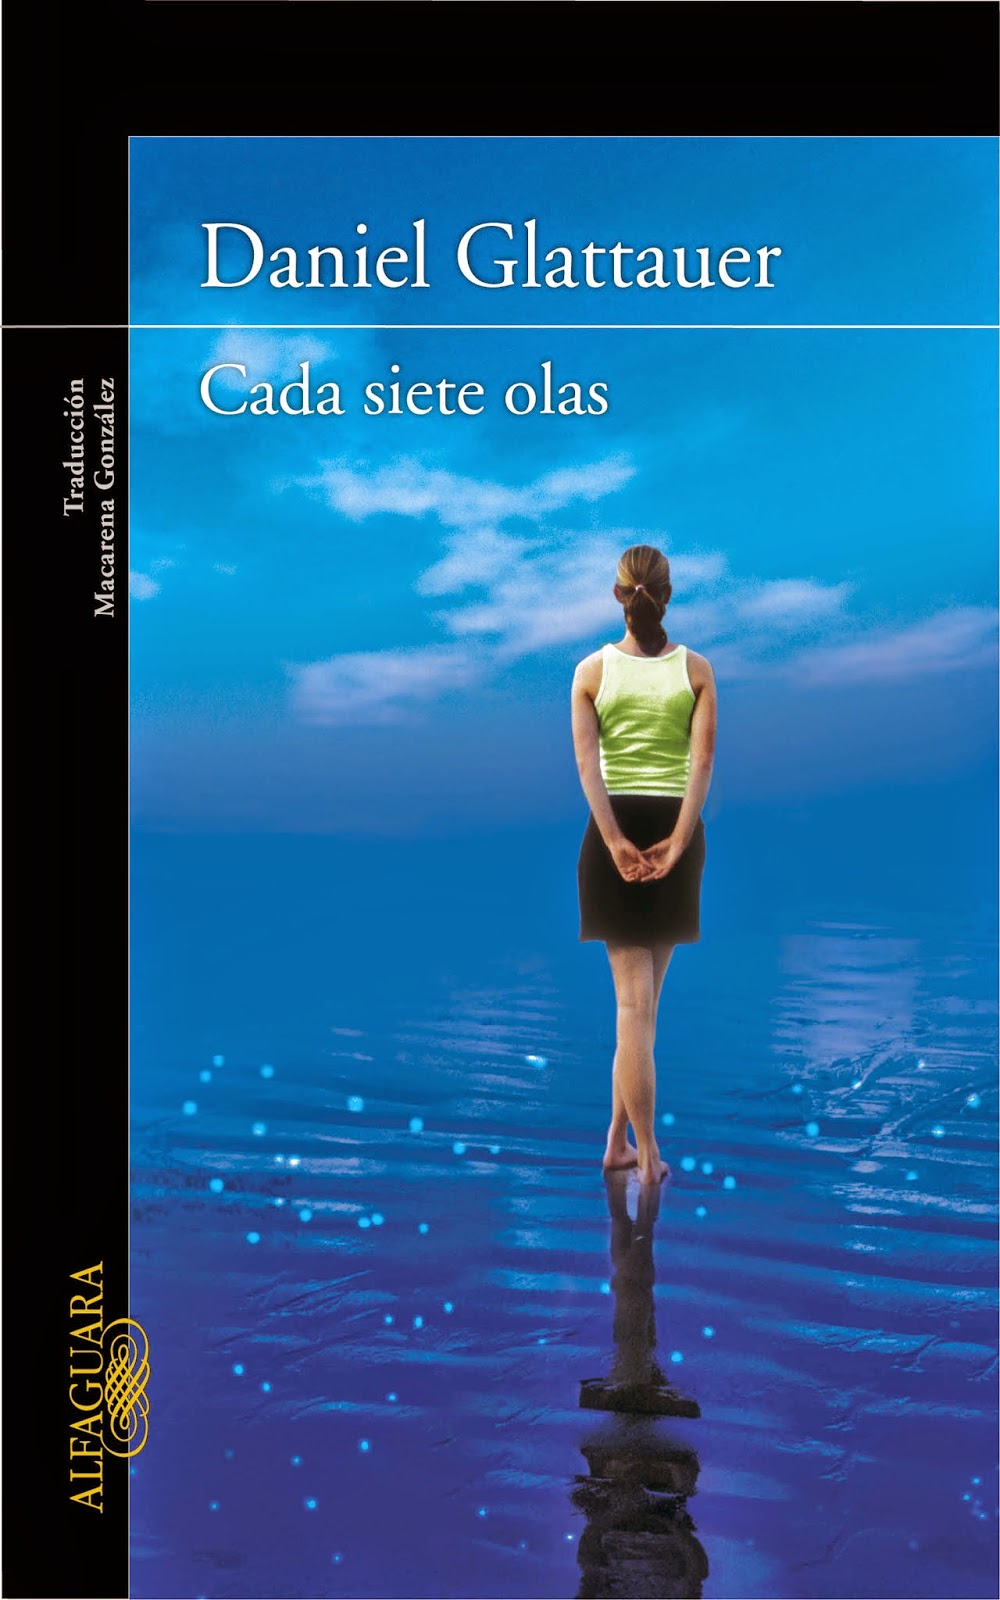 http://labibliotecadebella.blogspot.com.es/2015/04/cada-siete-olas-daniel-glattauer.html